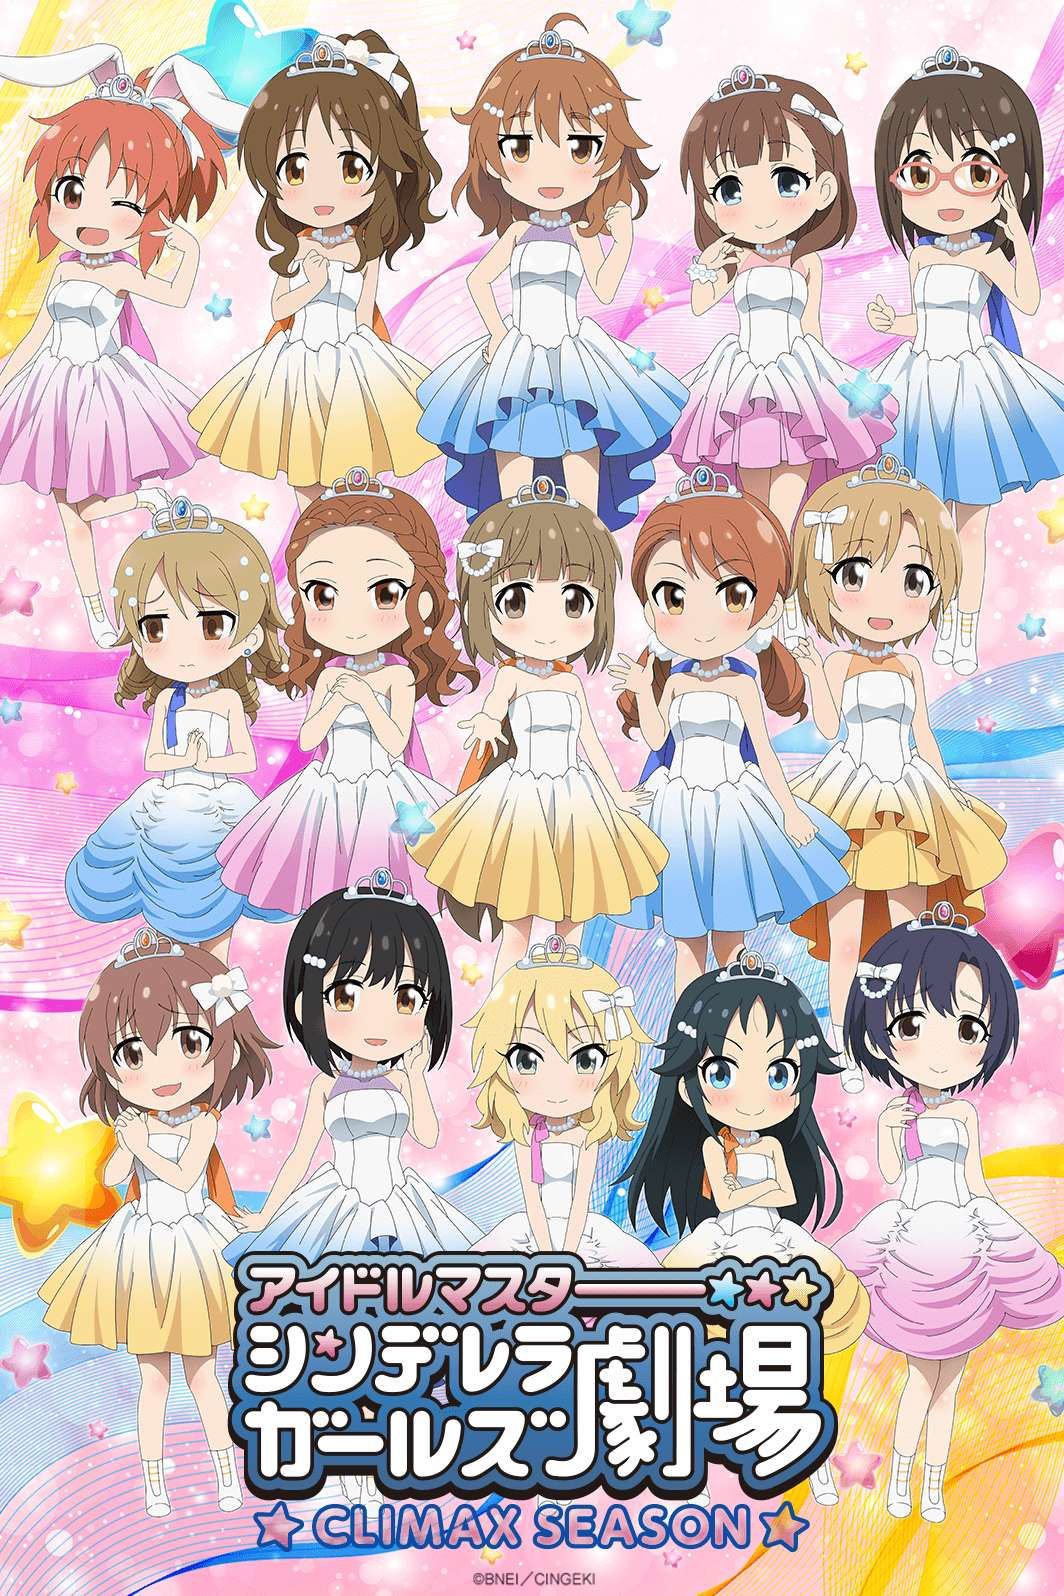 Poster of Cinderella Girls Gekijou: Climax Season